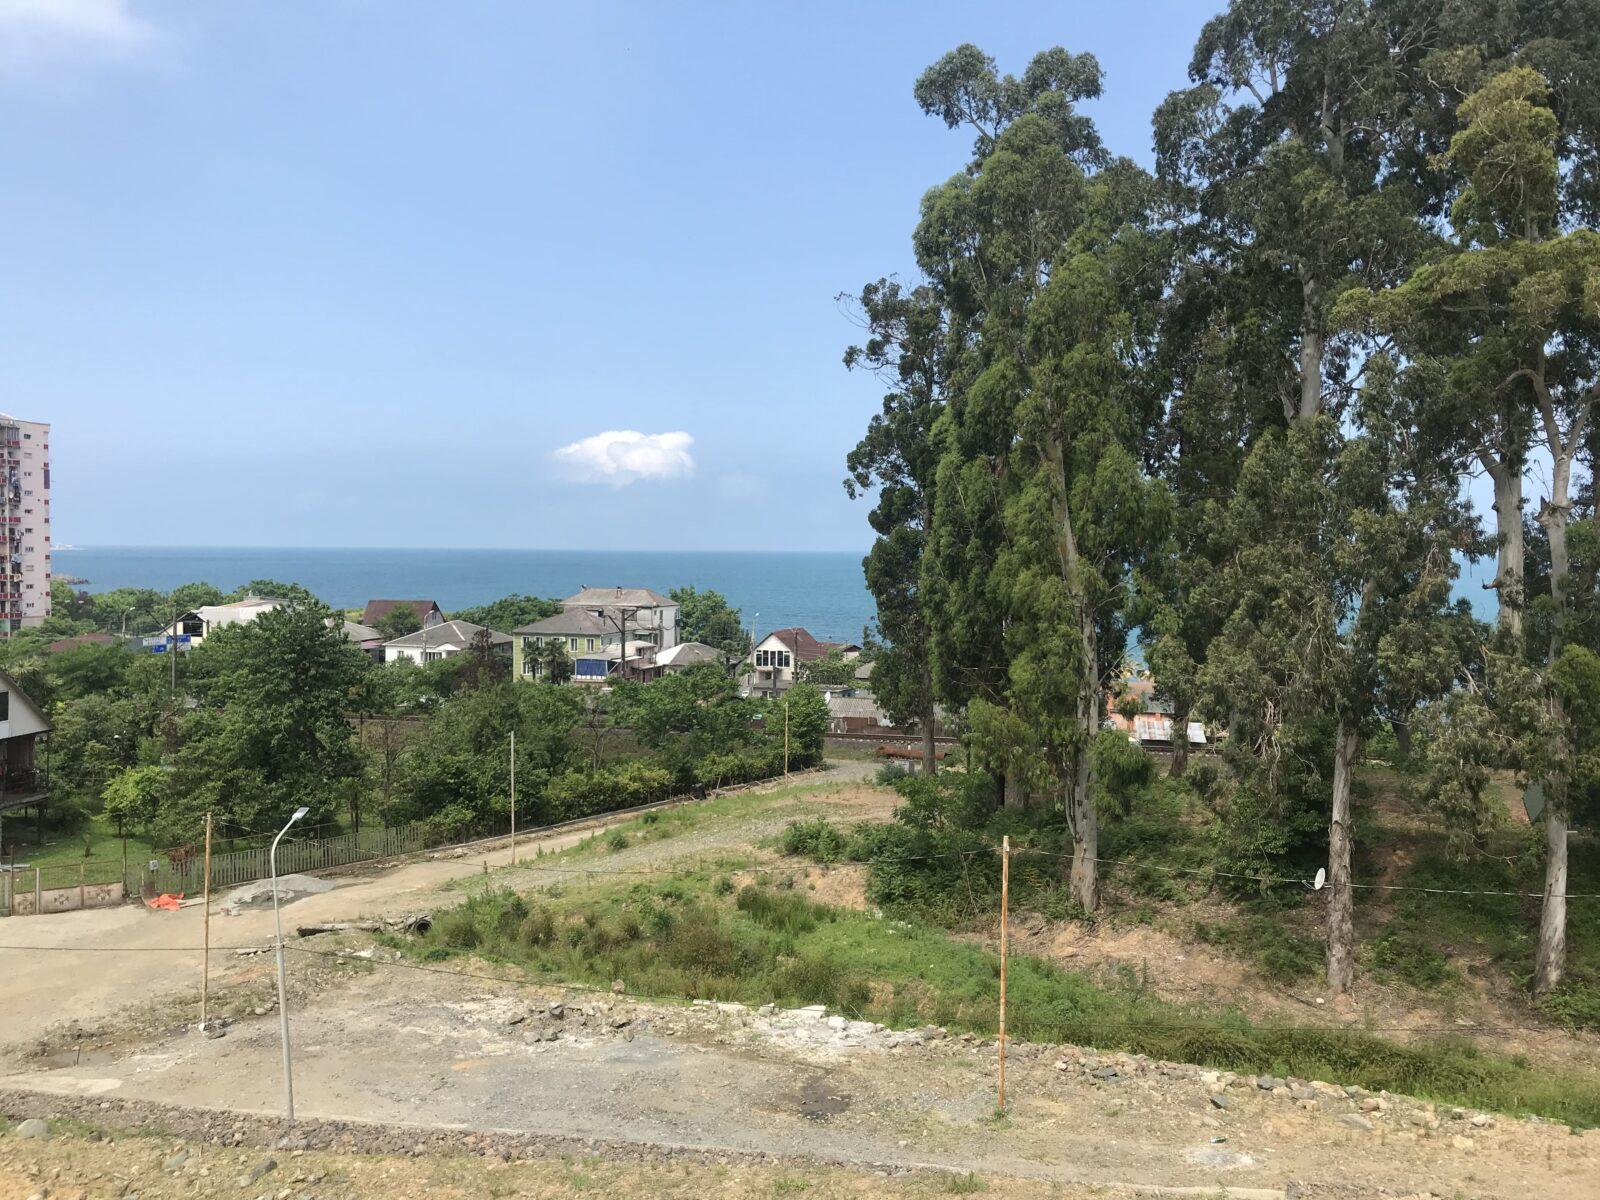 земля в Грузии с видом на море